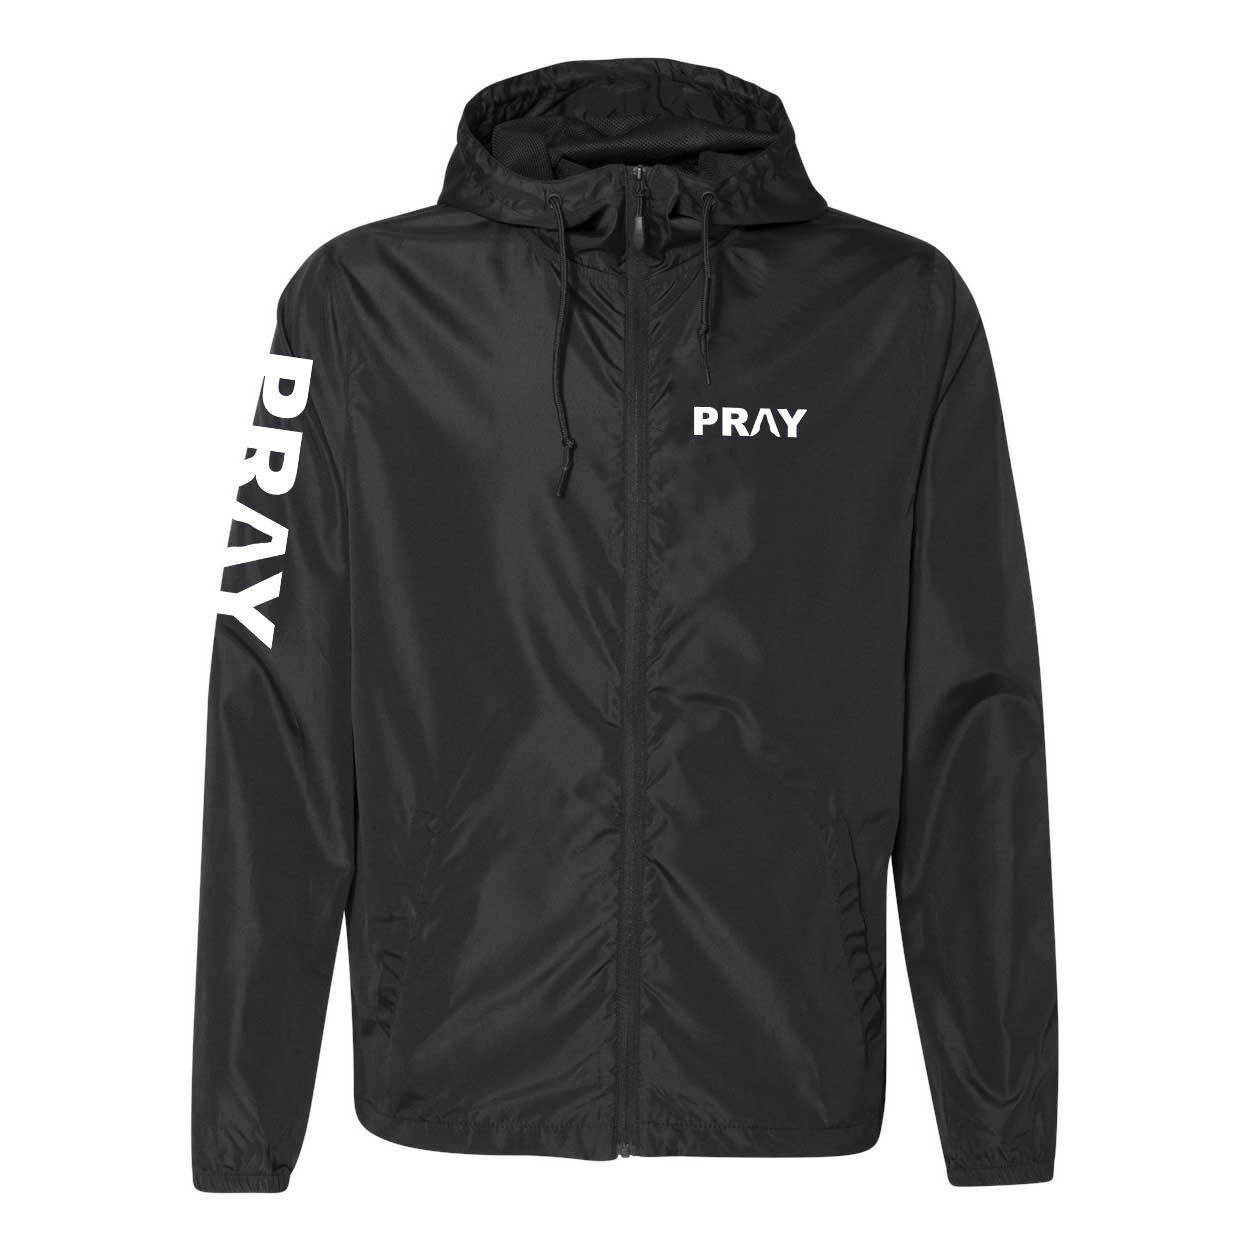 Pray Hands Logo Classic Lightweight Windbreaker Black (White Logo)